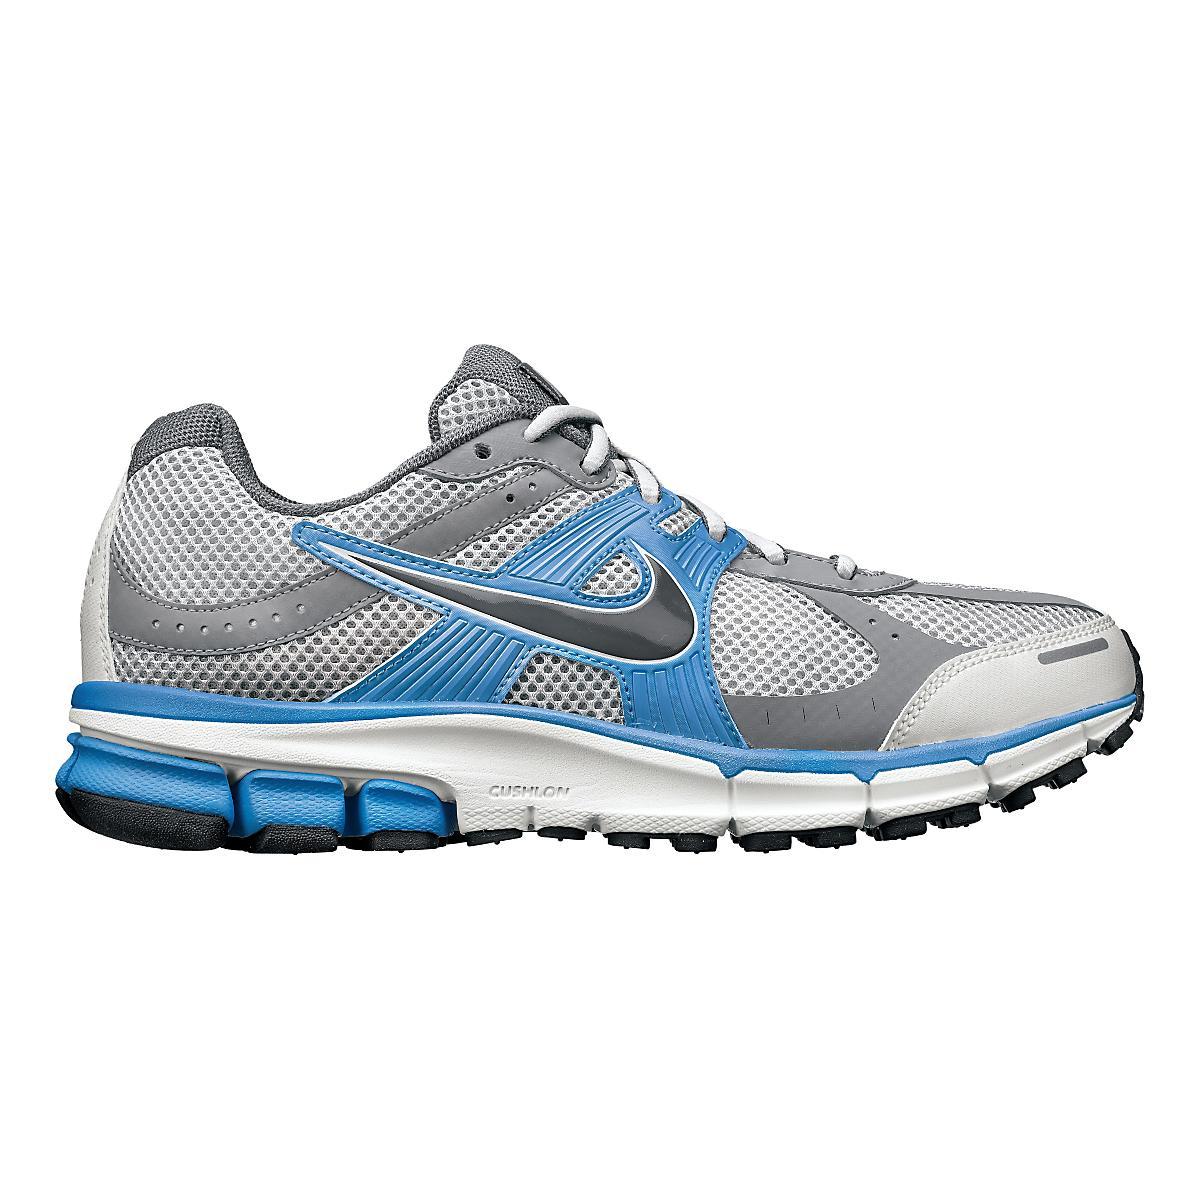 3b5bc258f649 Womens Nike Air Pegasus+ 27 Running Shoe at Road Runner Sports